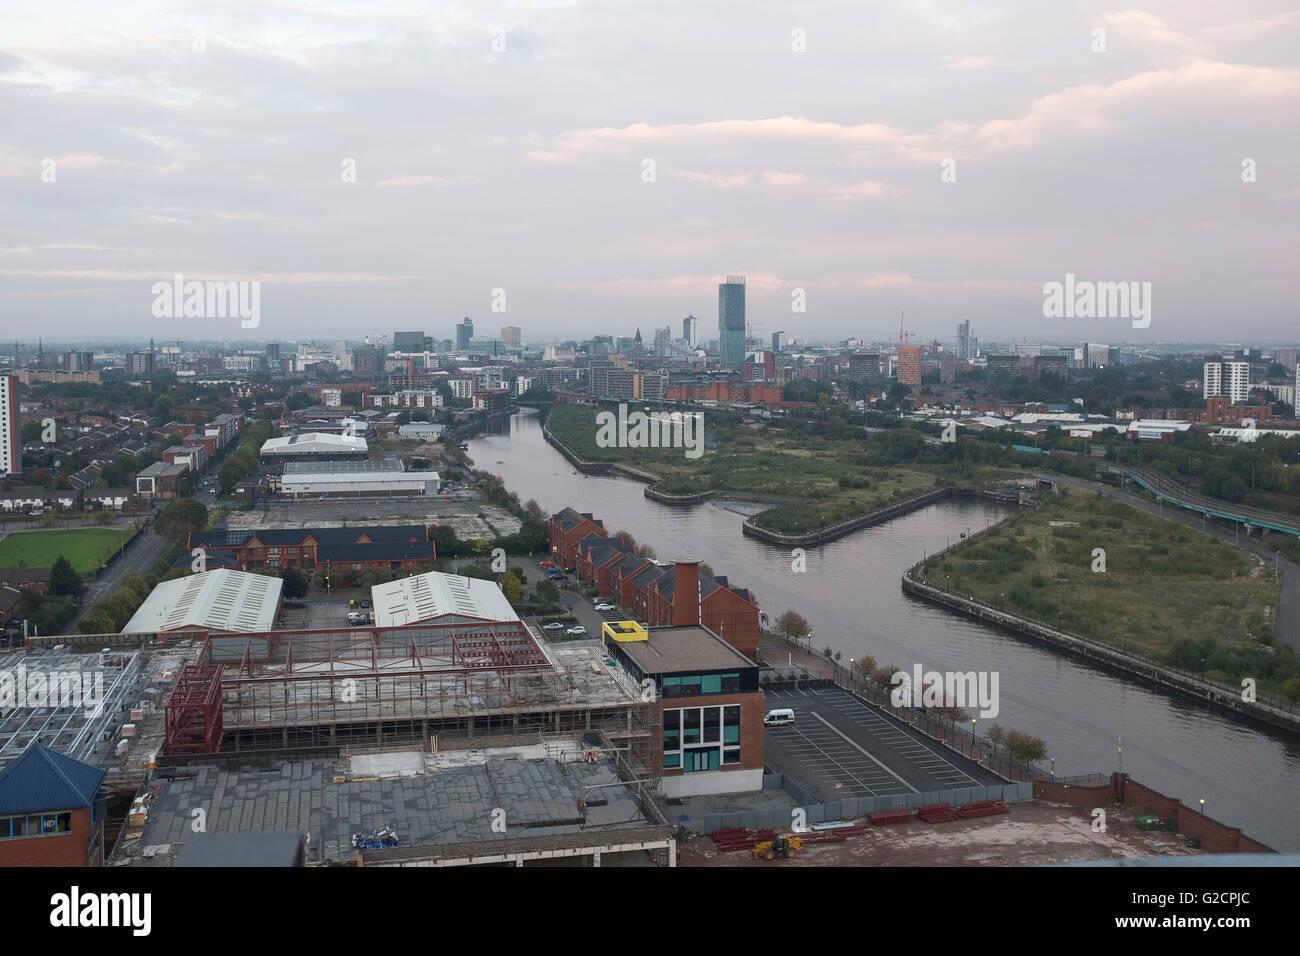 Manchester city centre panoramic skyline - Stock Image